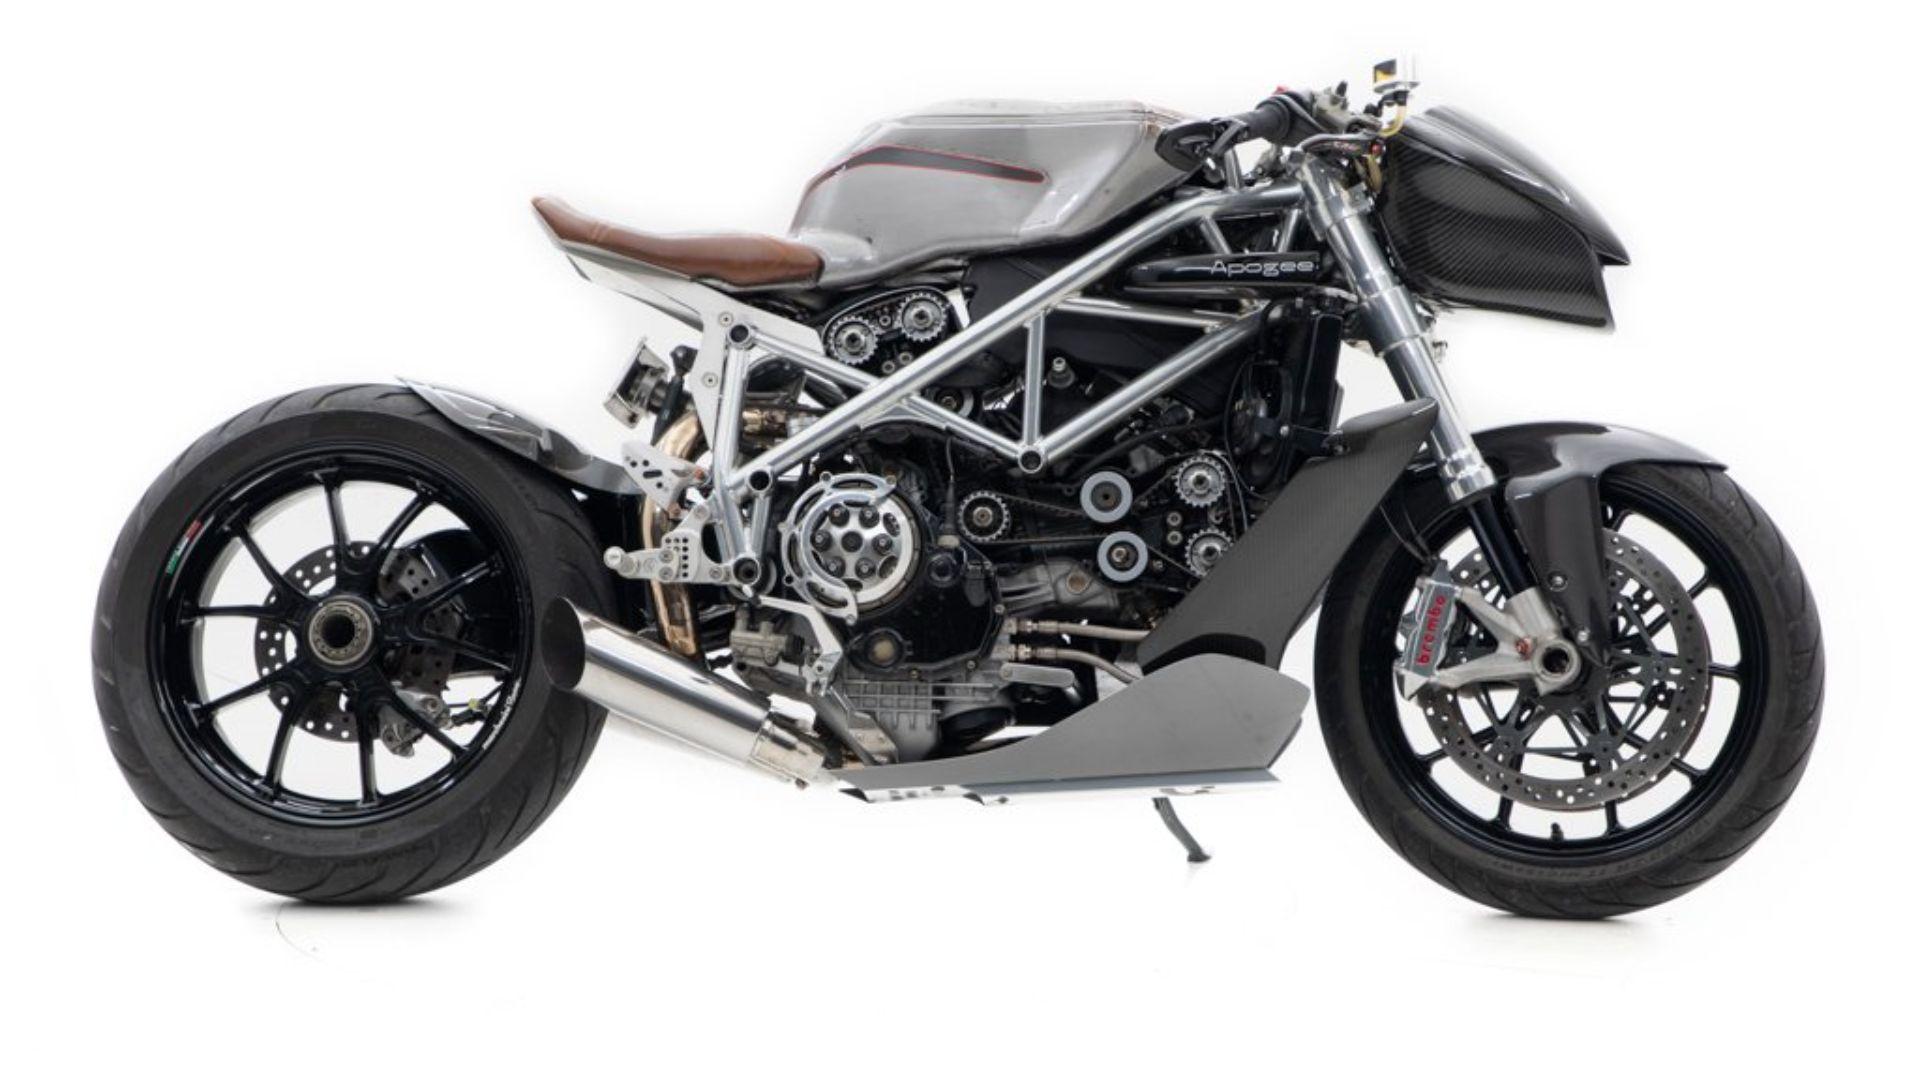 Motorcycle Monday: 2008 Ducati Apogee 1098R Raffale